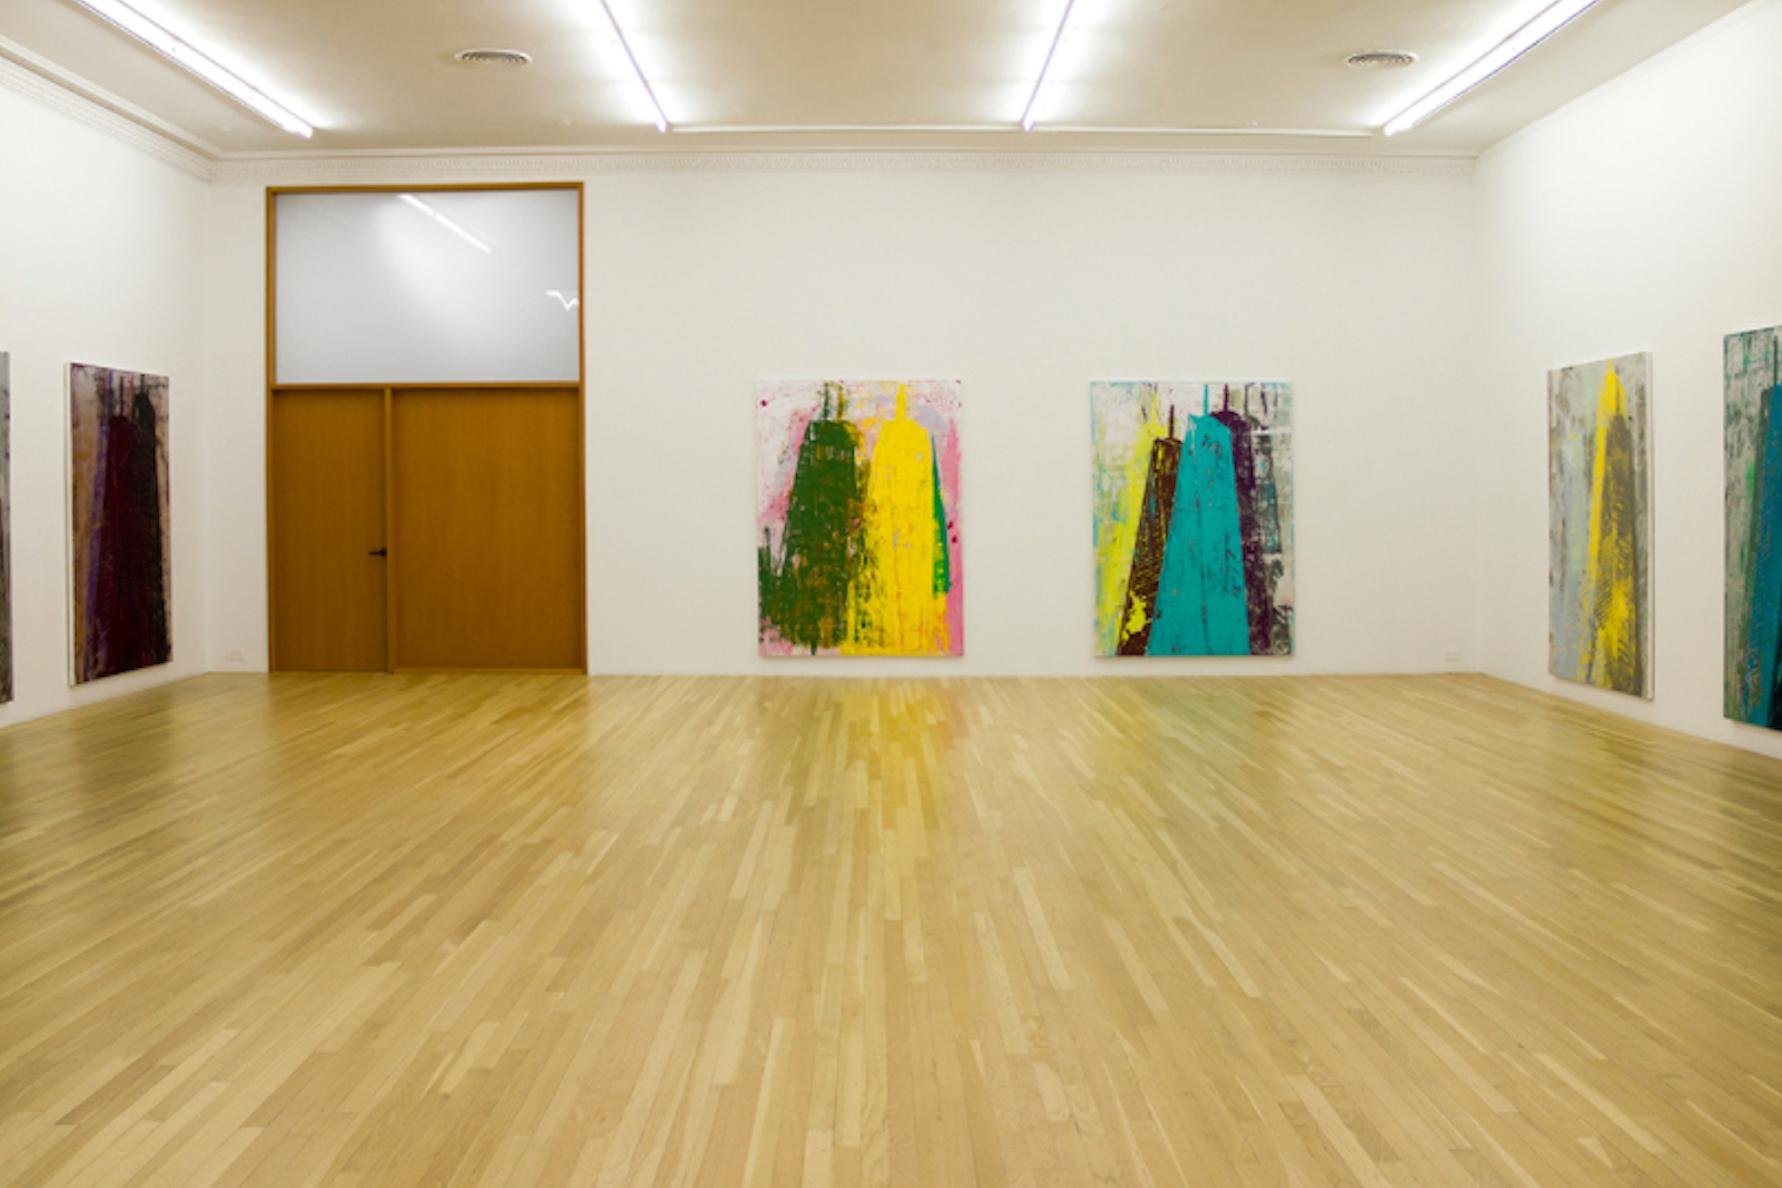 Peter Blum Gallery